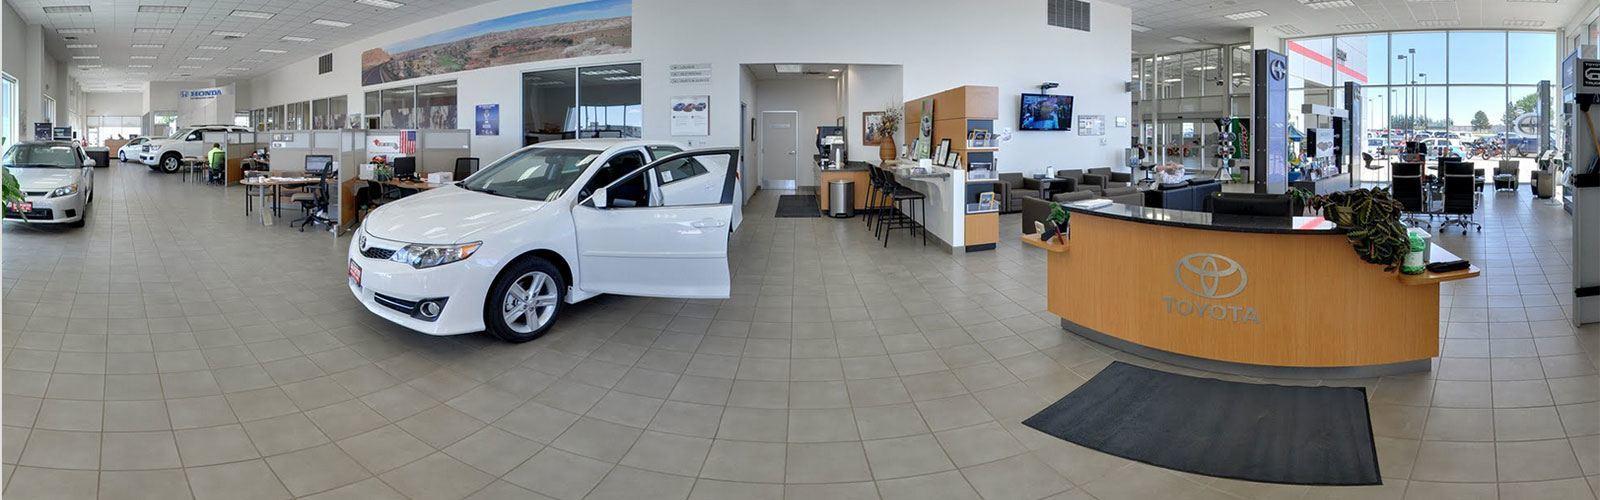 Car Dealer Virtual Tour